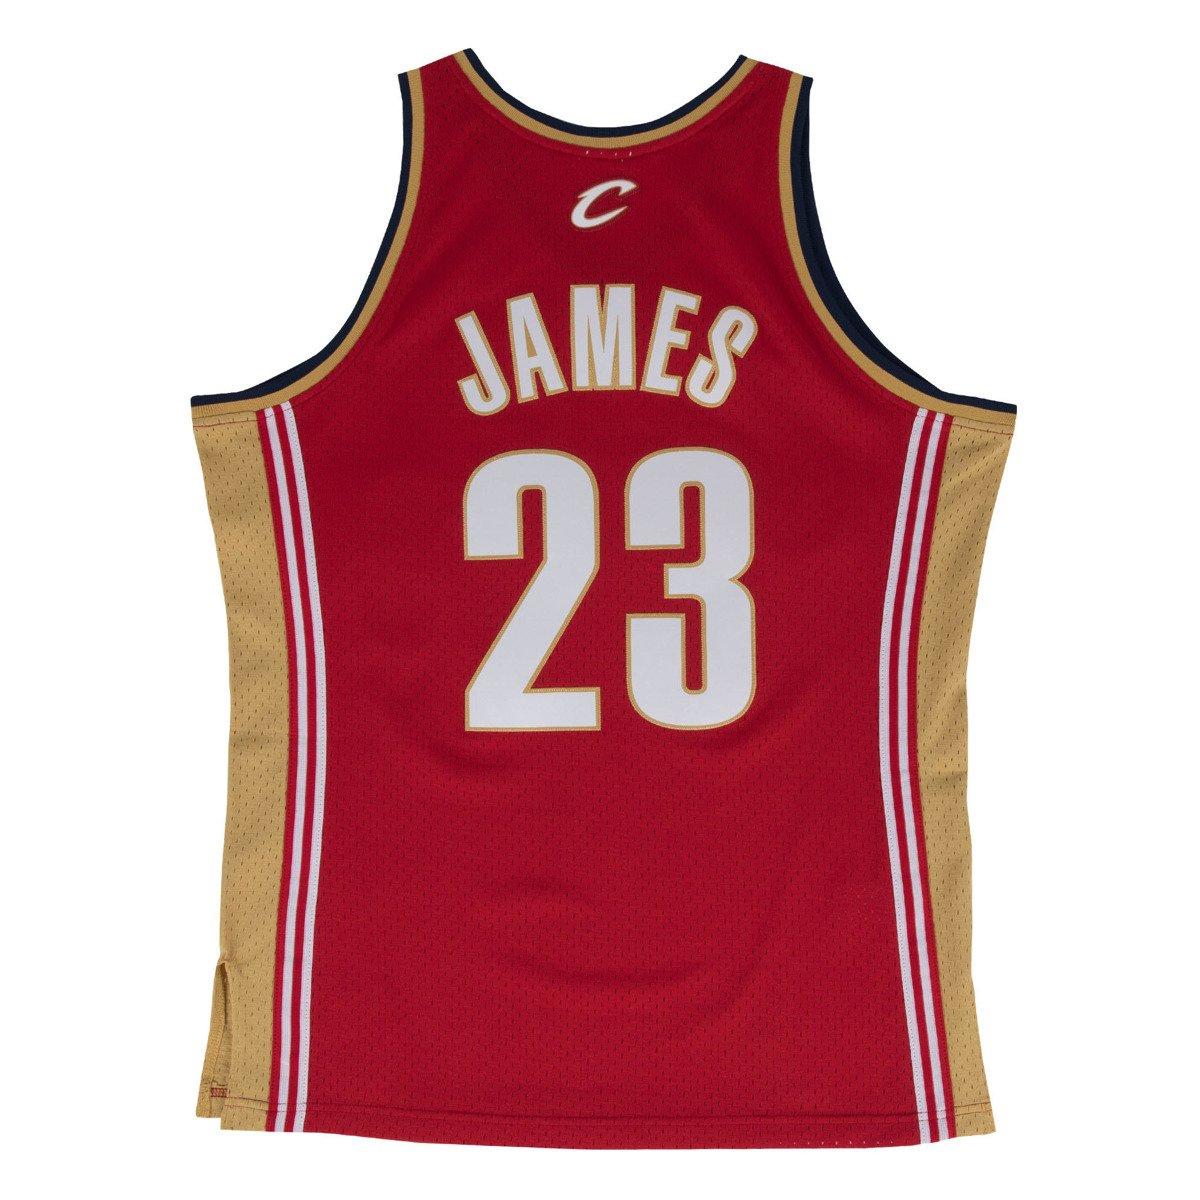 promo code d3ef8 84122 Mitchell & Ness LeBron James 2003-04 NBA Swingman Cleveland Cavaliers Jersey